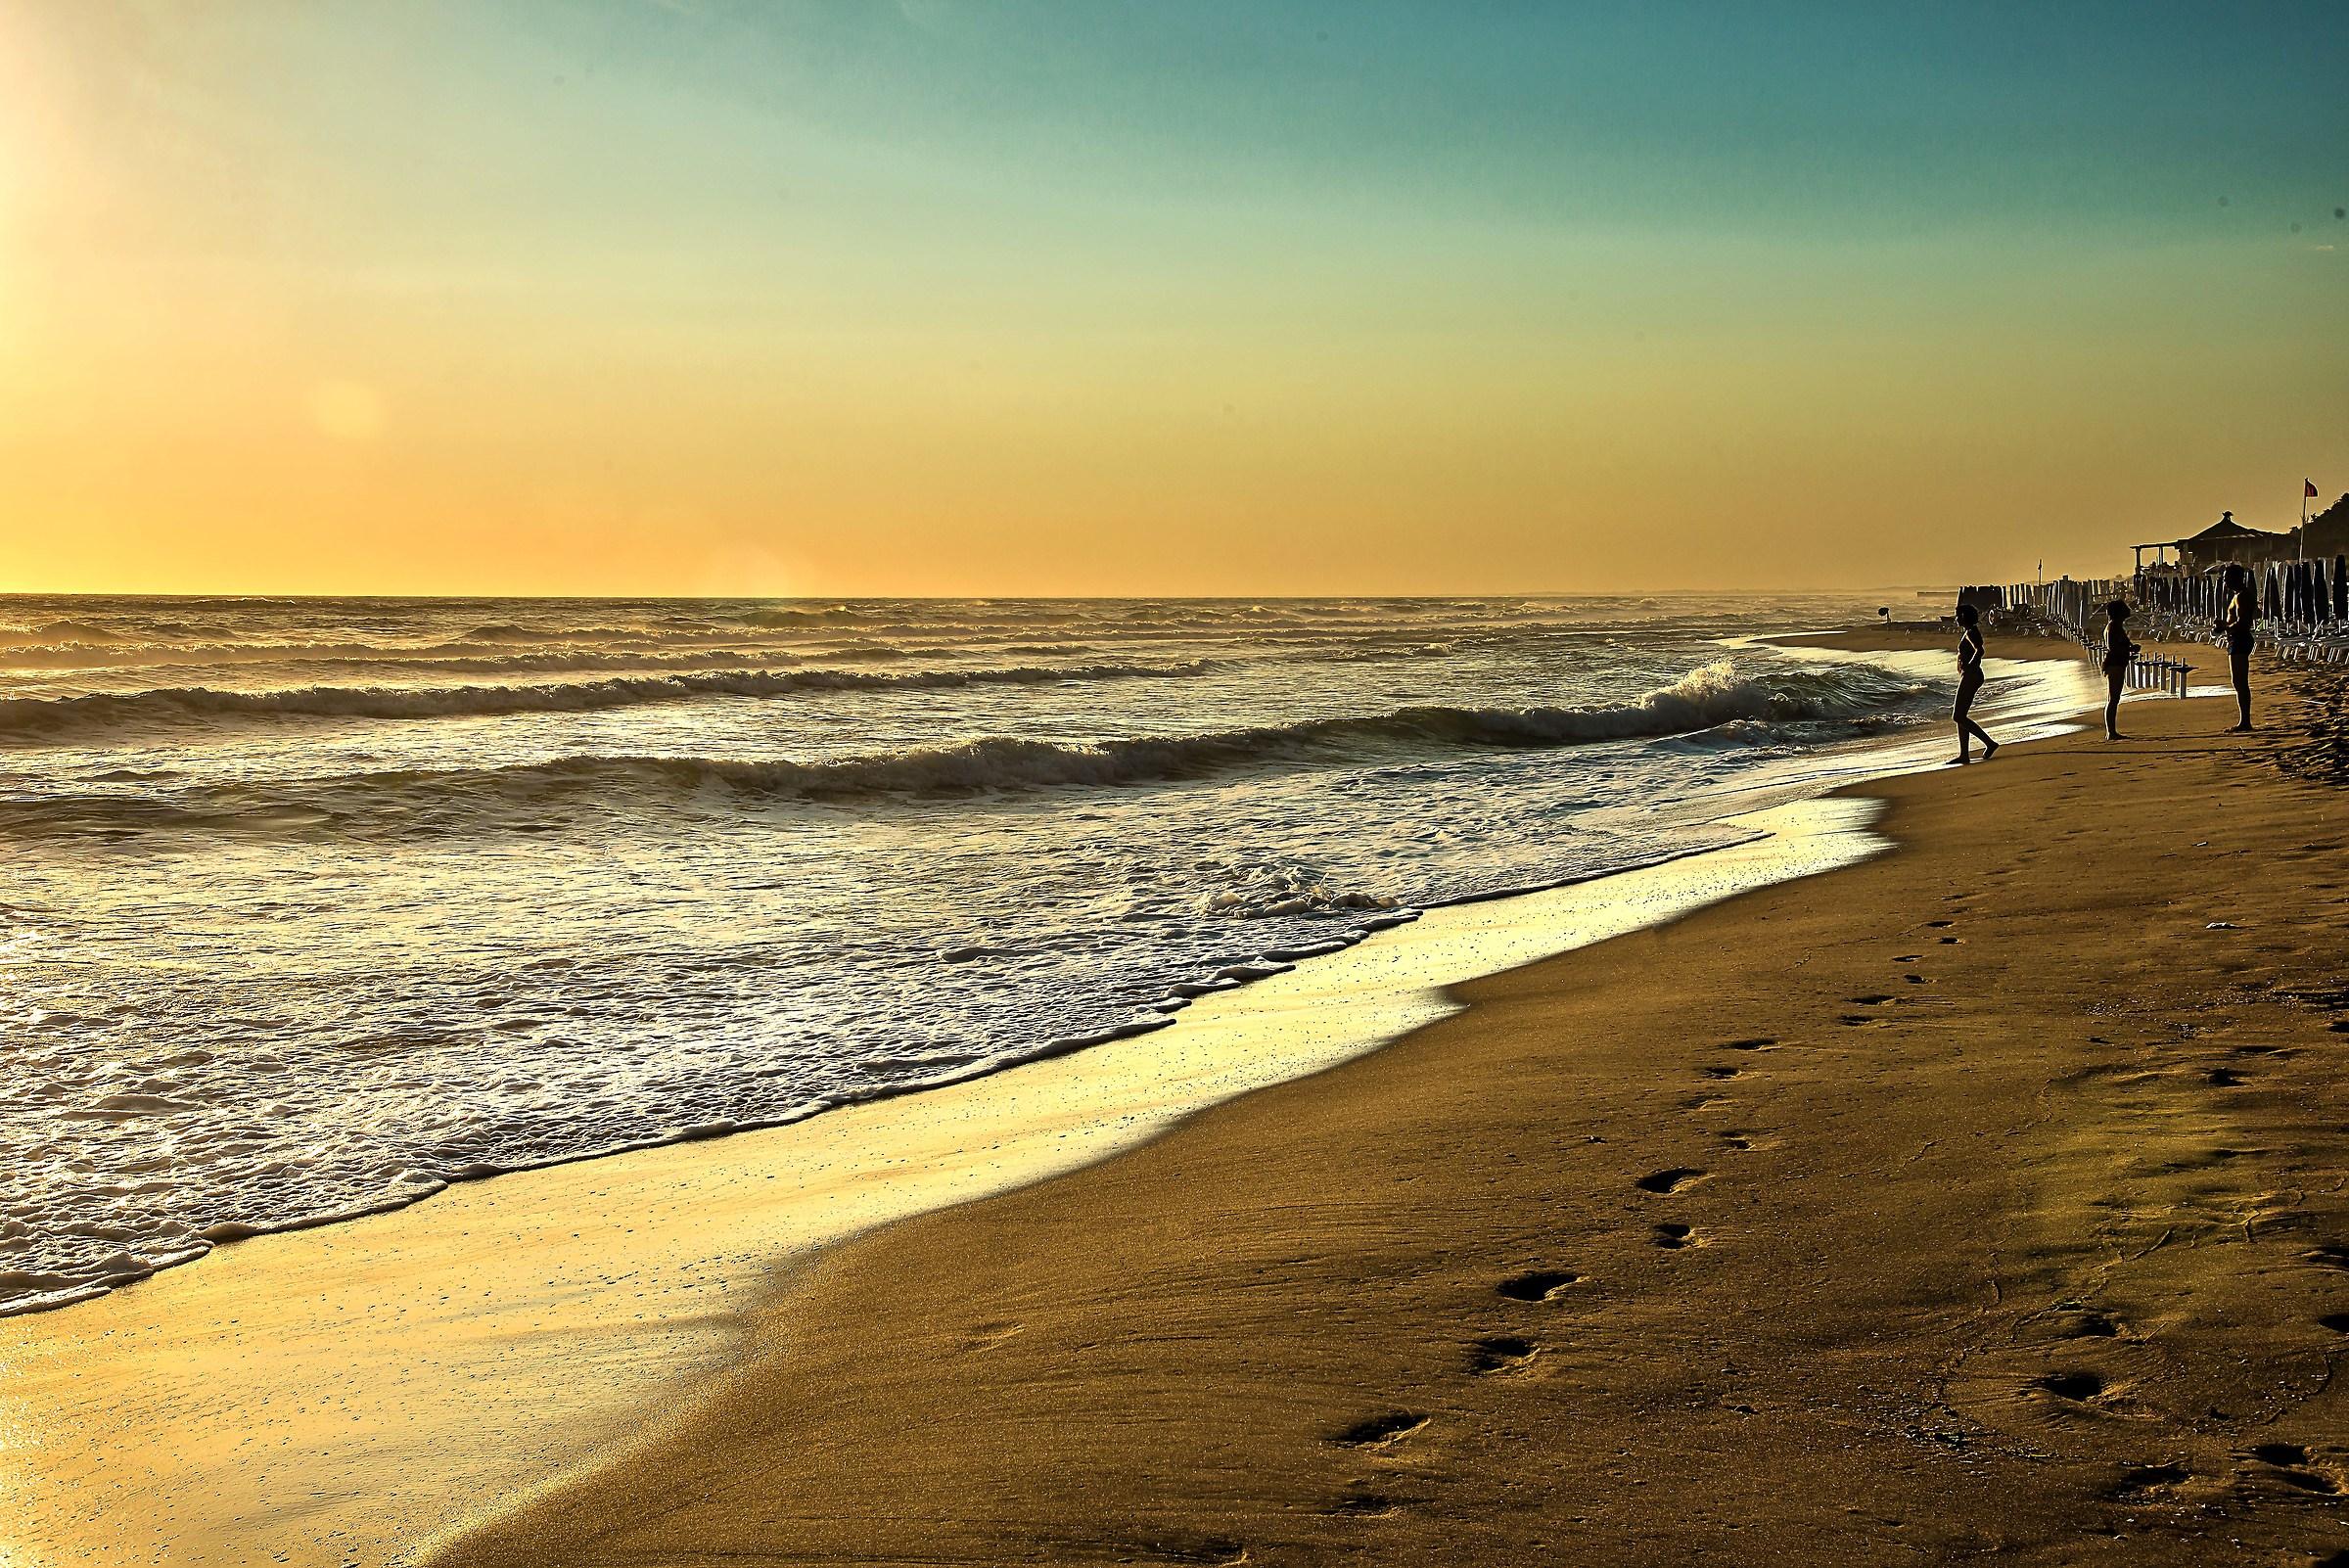 At the beach at sunset...